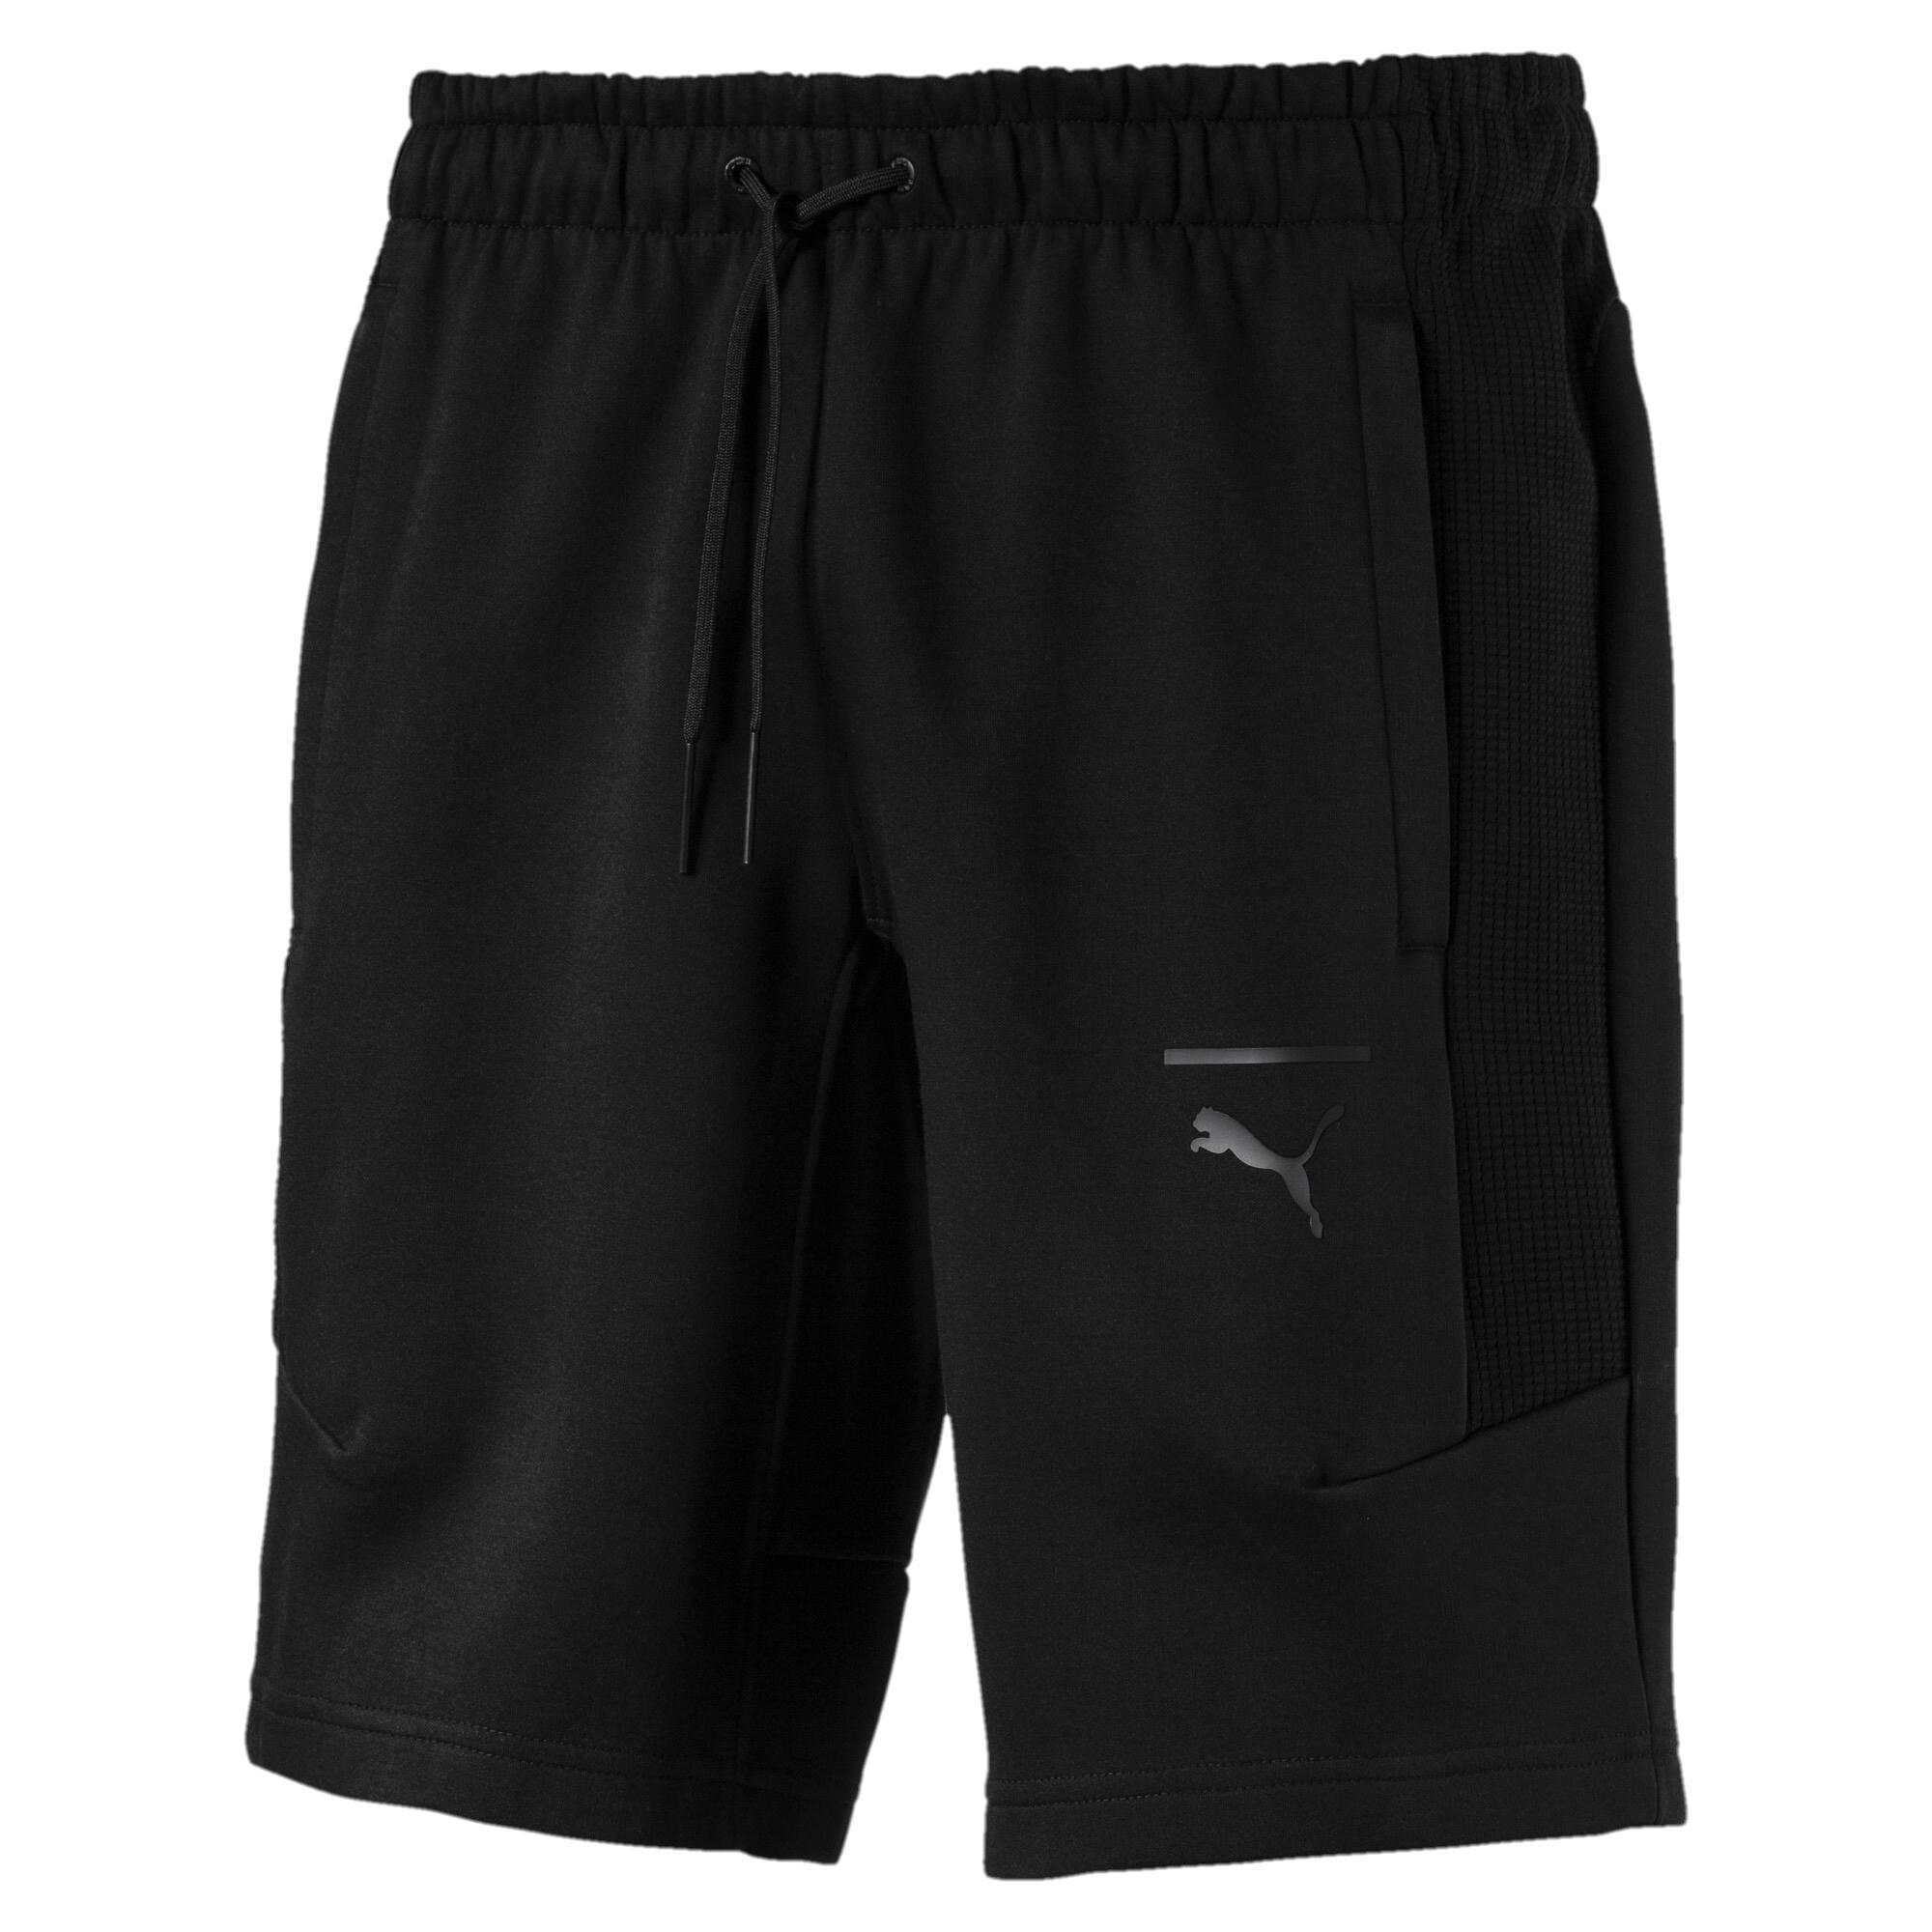 b6949635e6 Image Puma Pace Men's Sweat Shorts #1. Zoom In